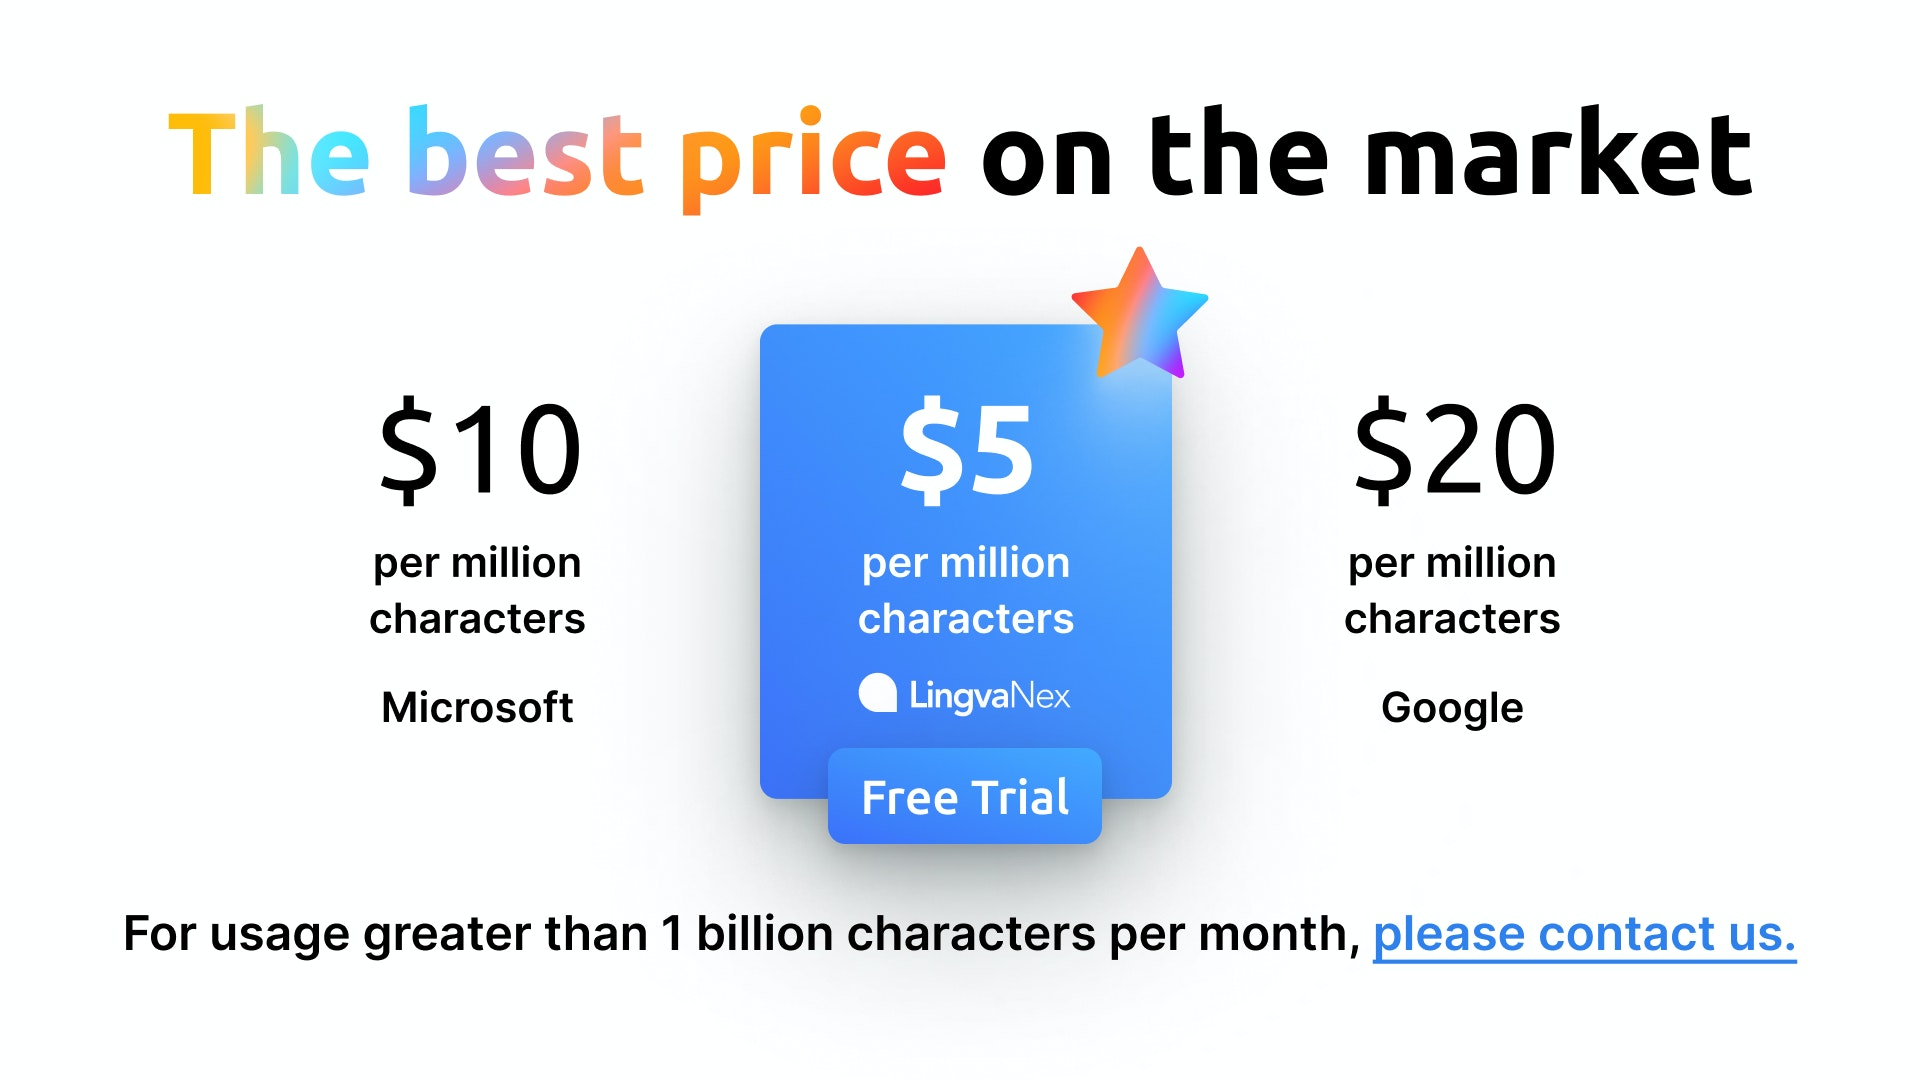 Machine Translation by Lingvanex Product Hunt Image